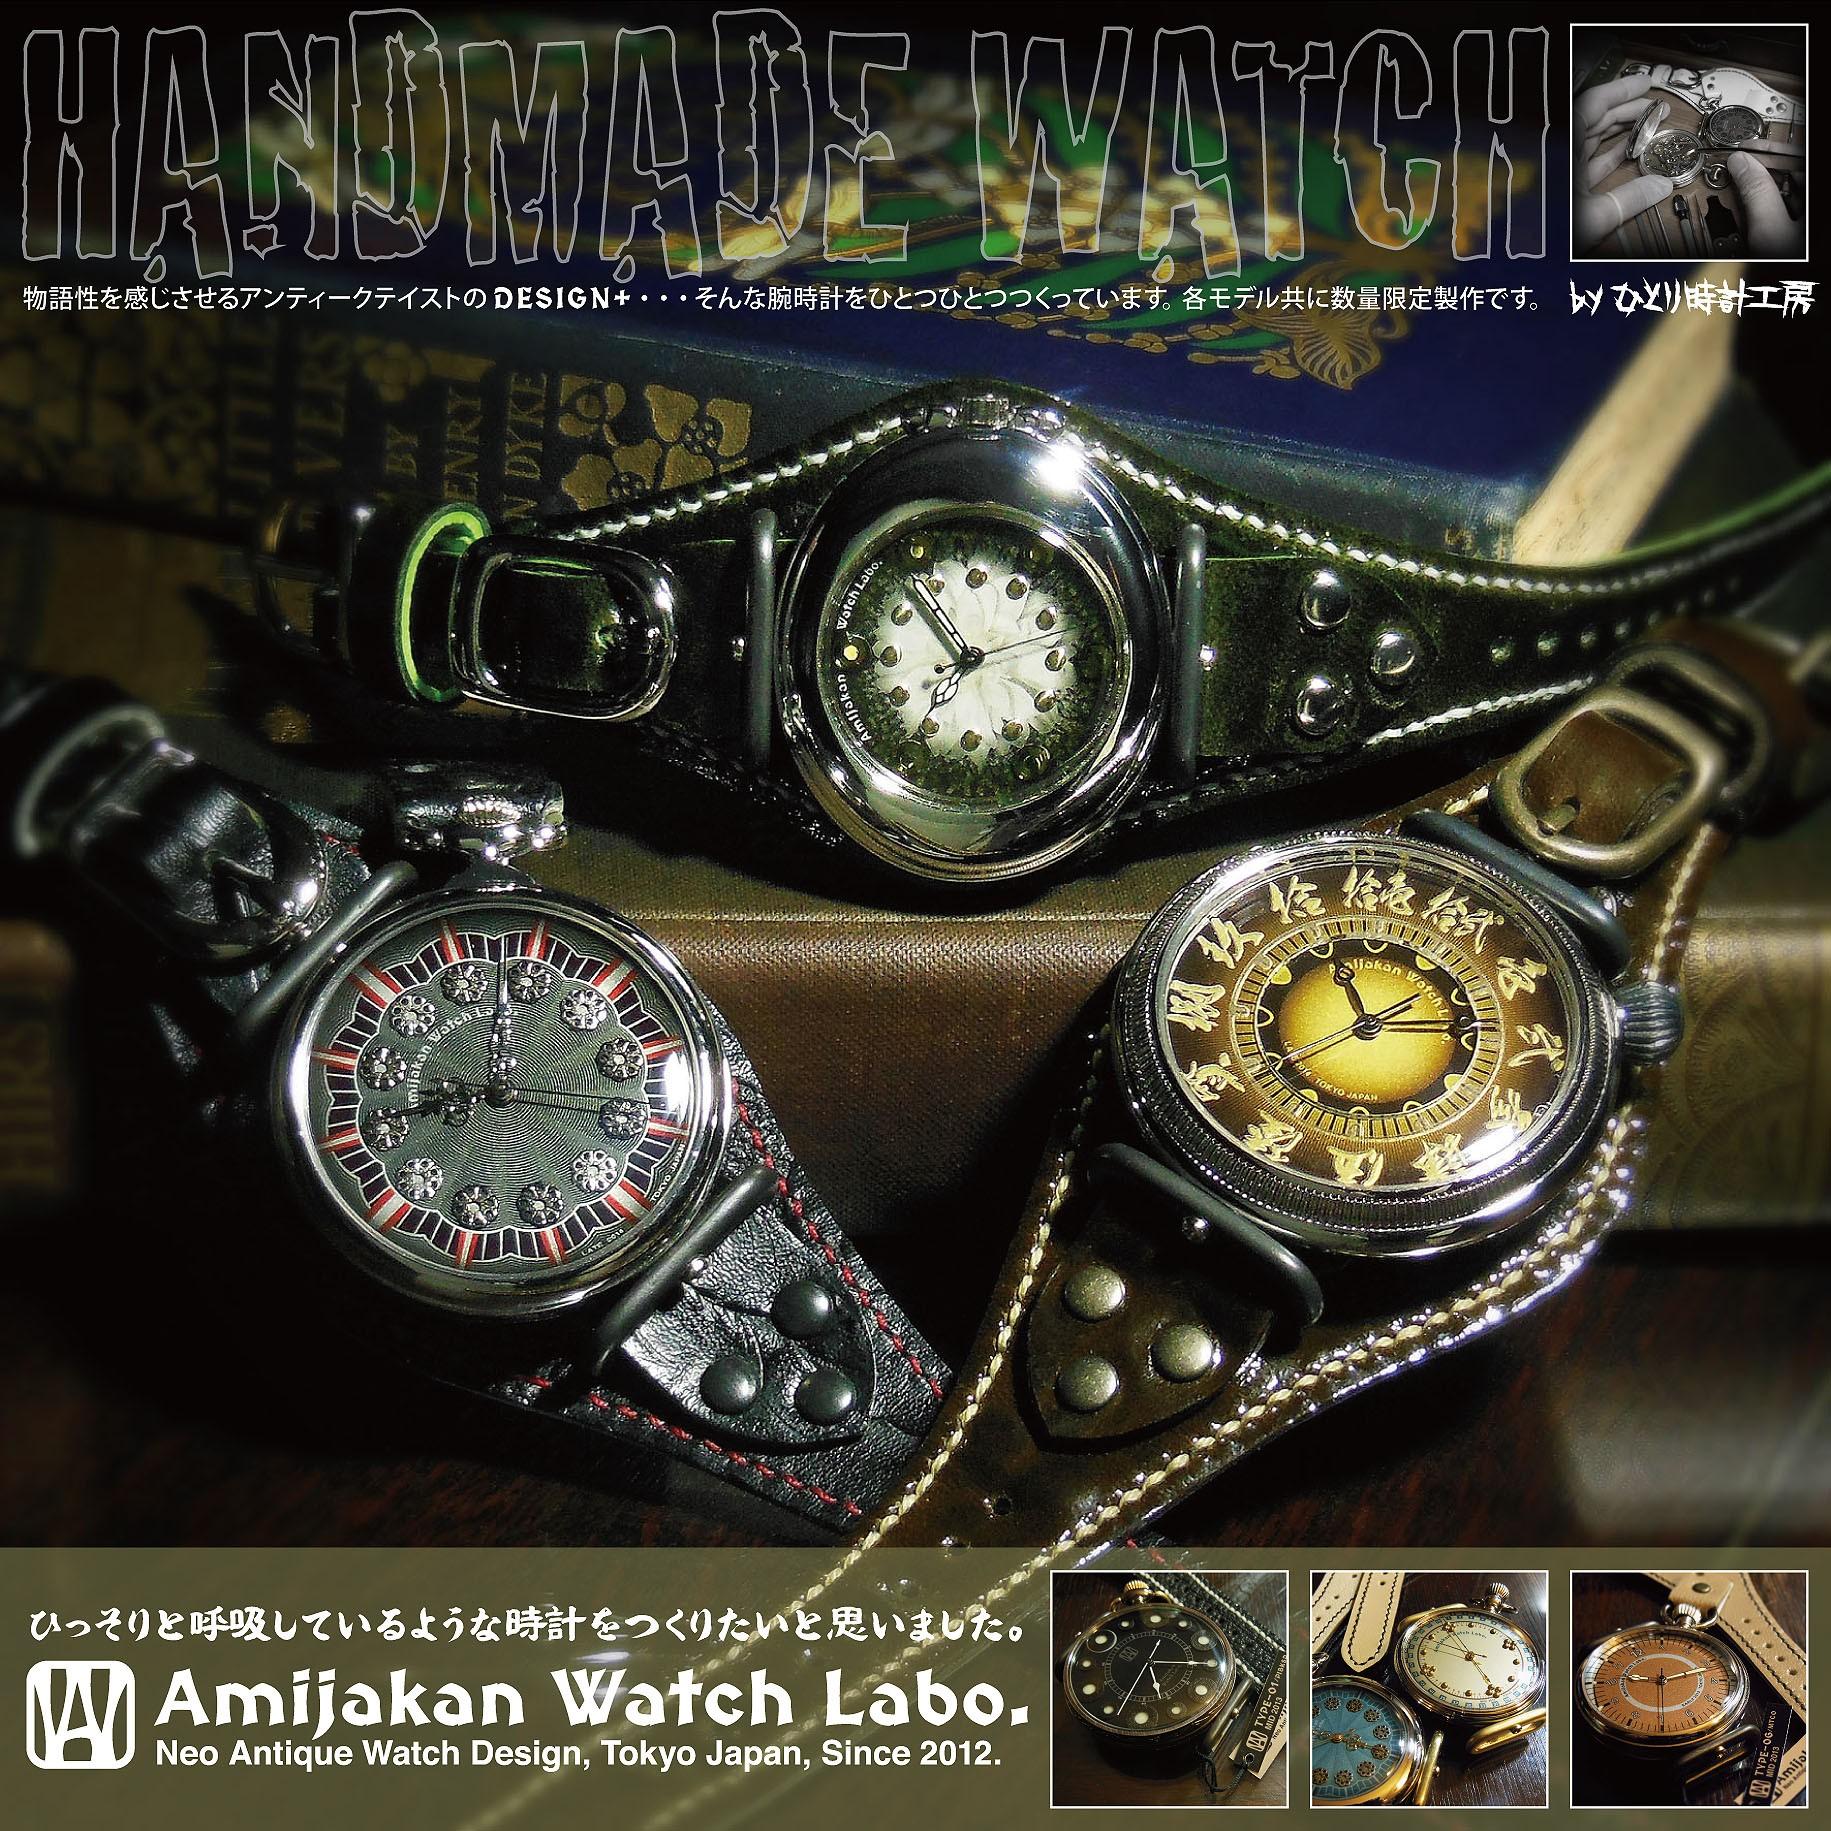 Amijakan Watch Labo.